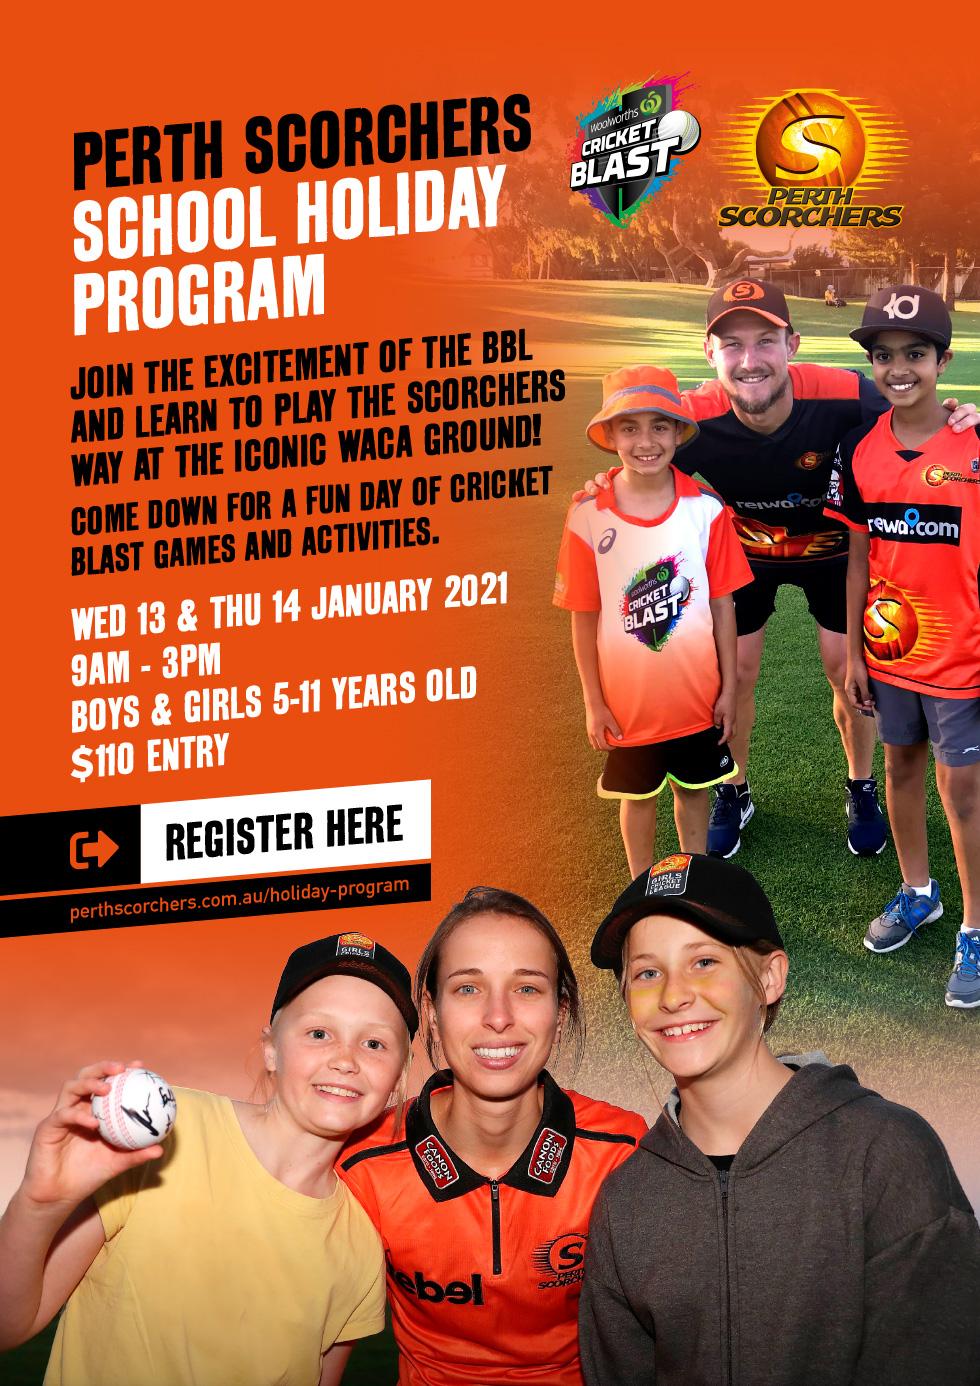 Perth Scorchers School Holiday Program